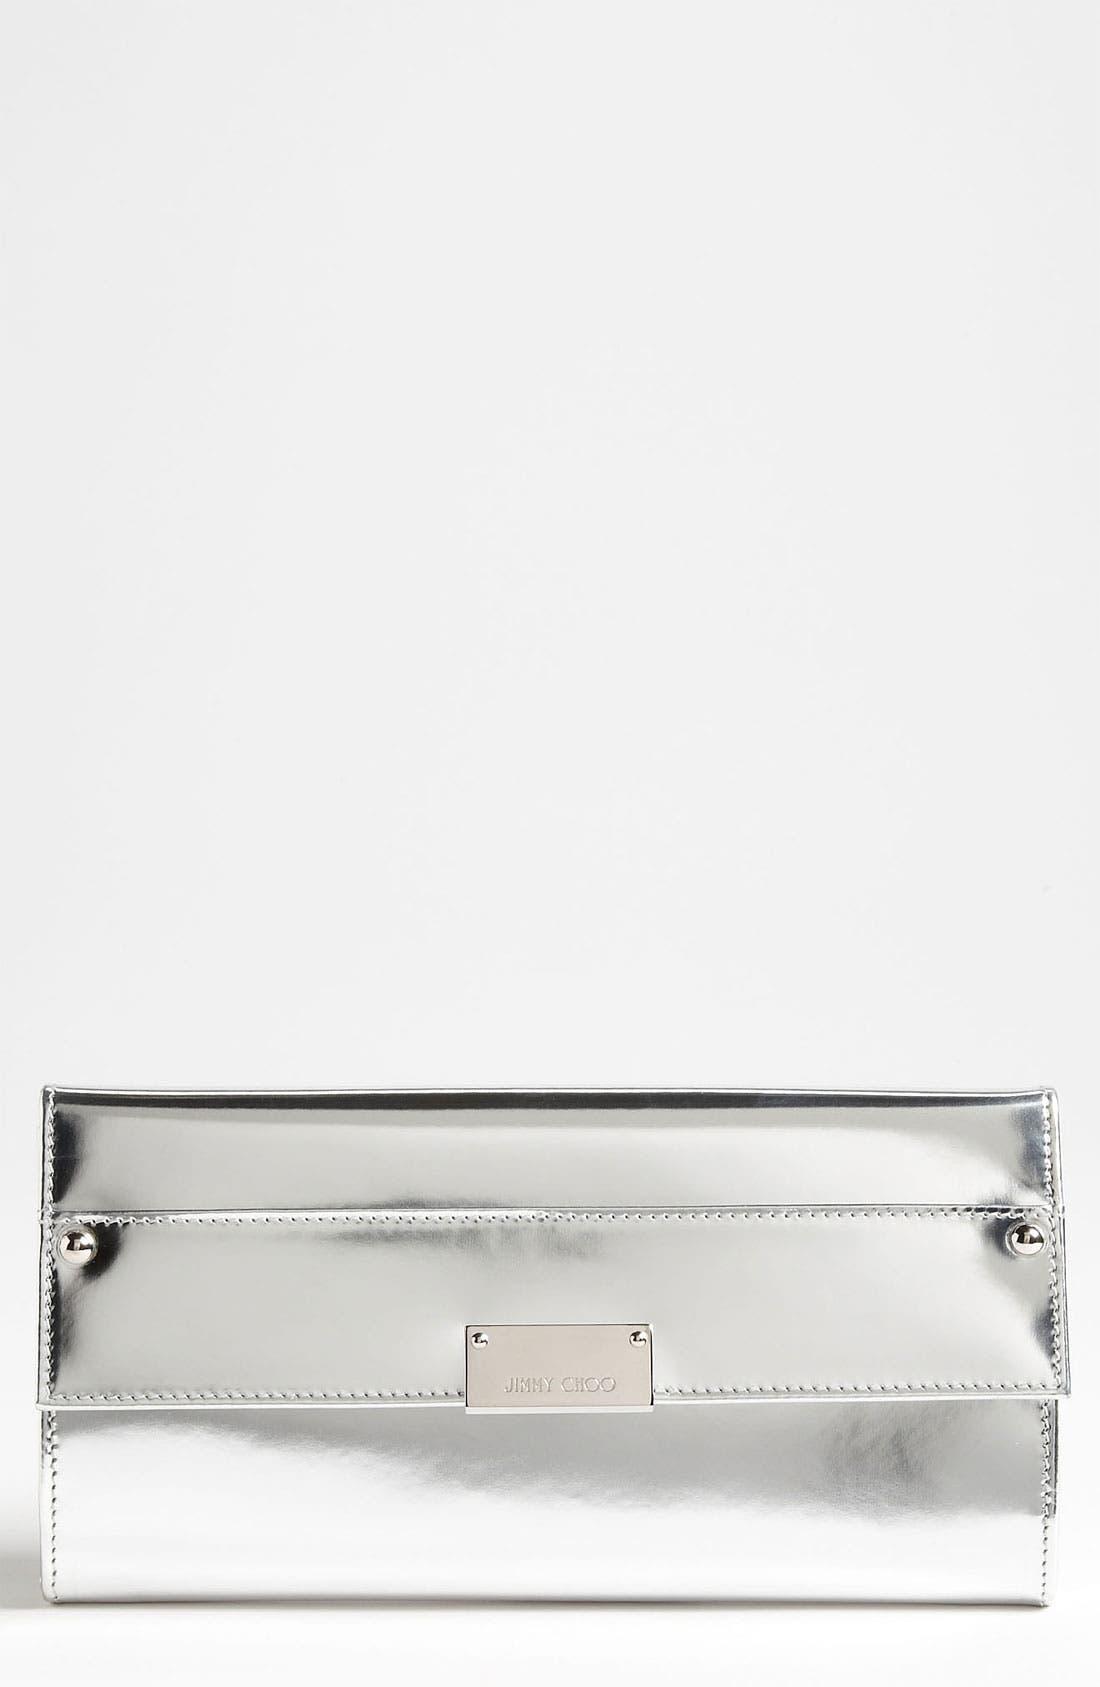 Main Image - Jimmy Choo 'Reese' Metallic Leather Clutch